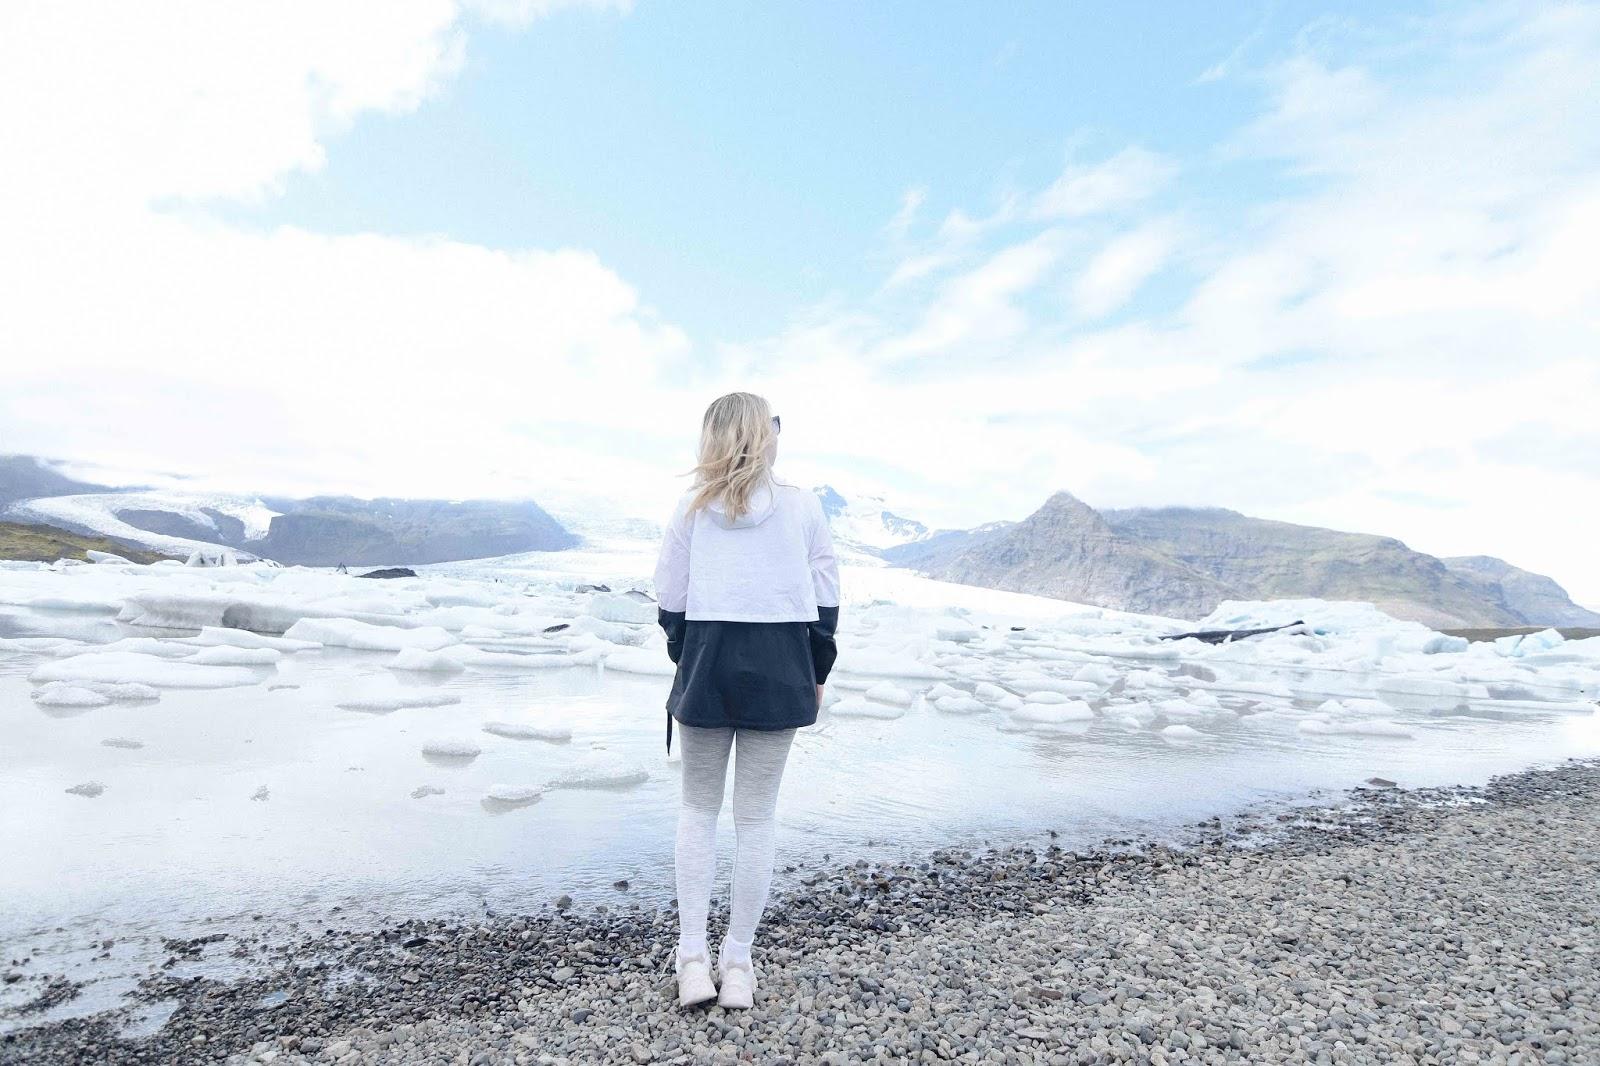 iceland drive travel to Glacier Lagoon/Jökusárlón and Diamond Beach and fjallsarlon